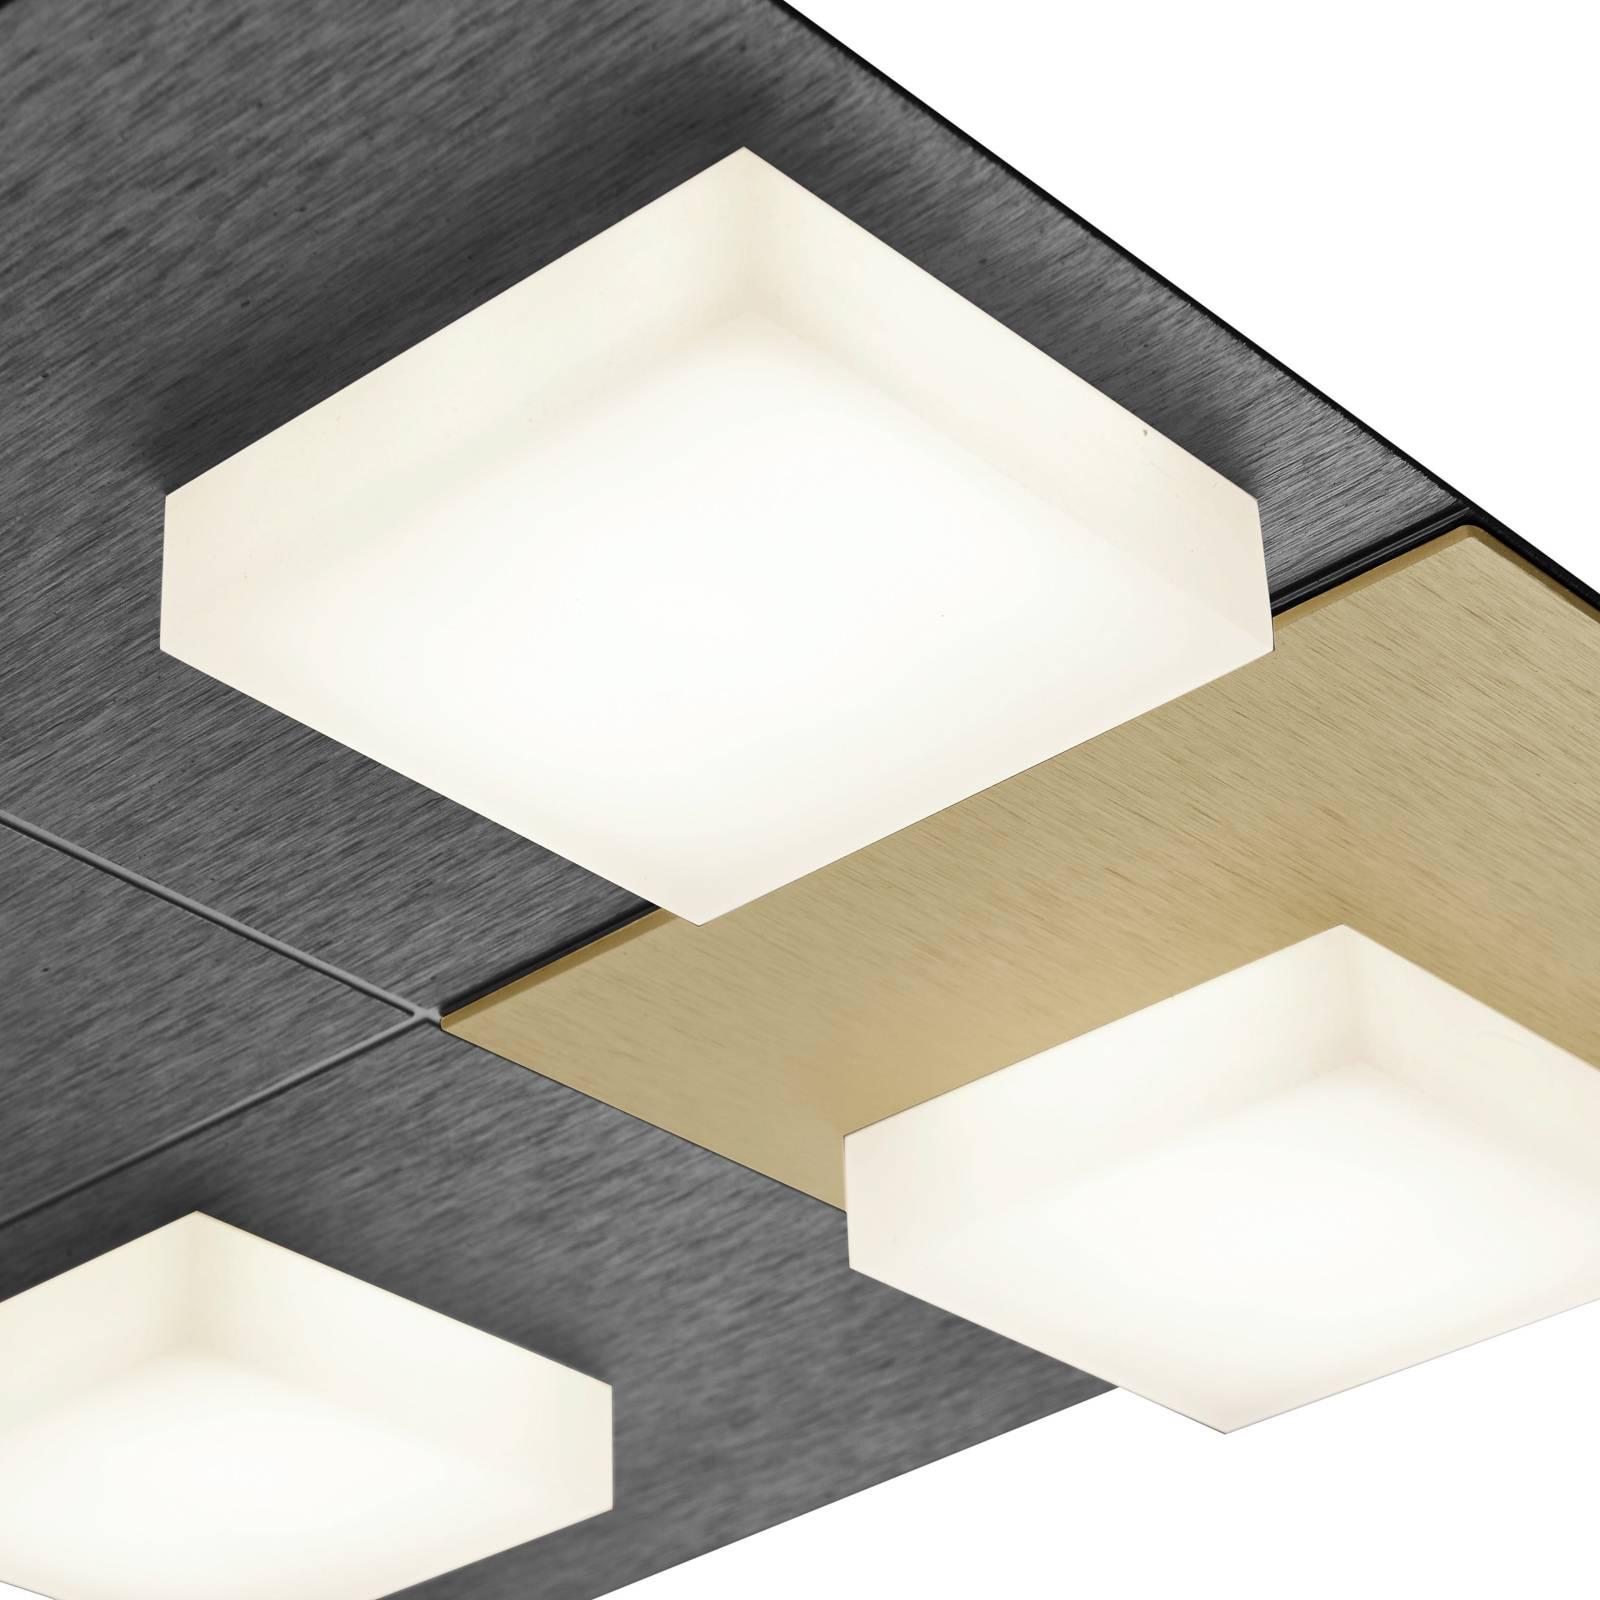 BANKAMP Cube plafondlamp 32W 28x28cm, antraciet